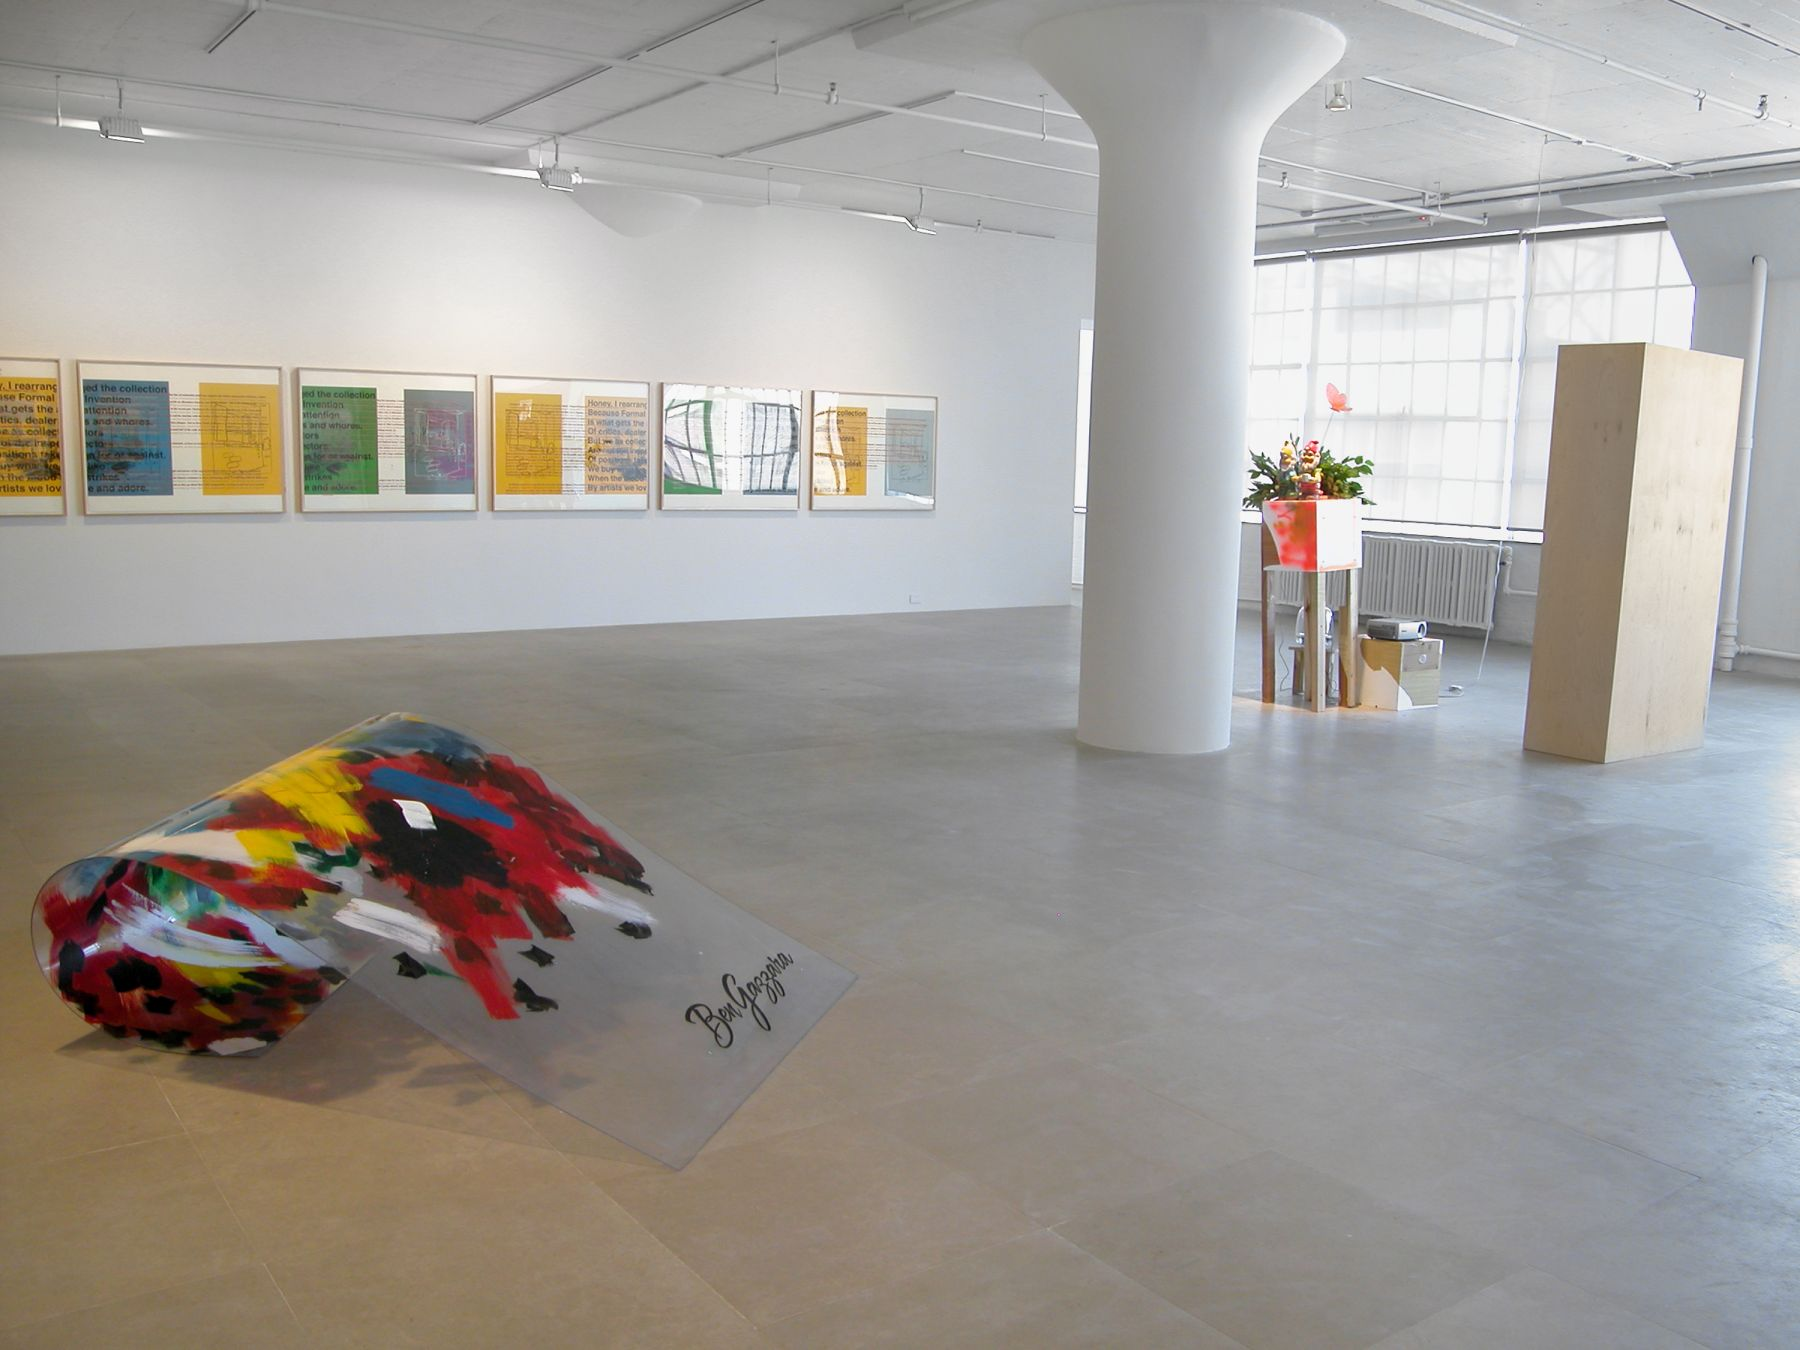 Installation view, Payday, Greene Naftali, New York, 2008